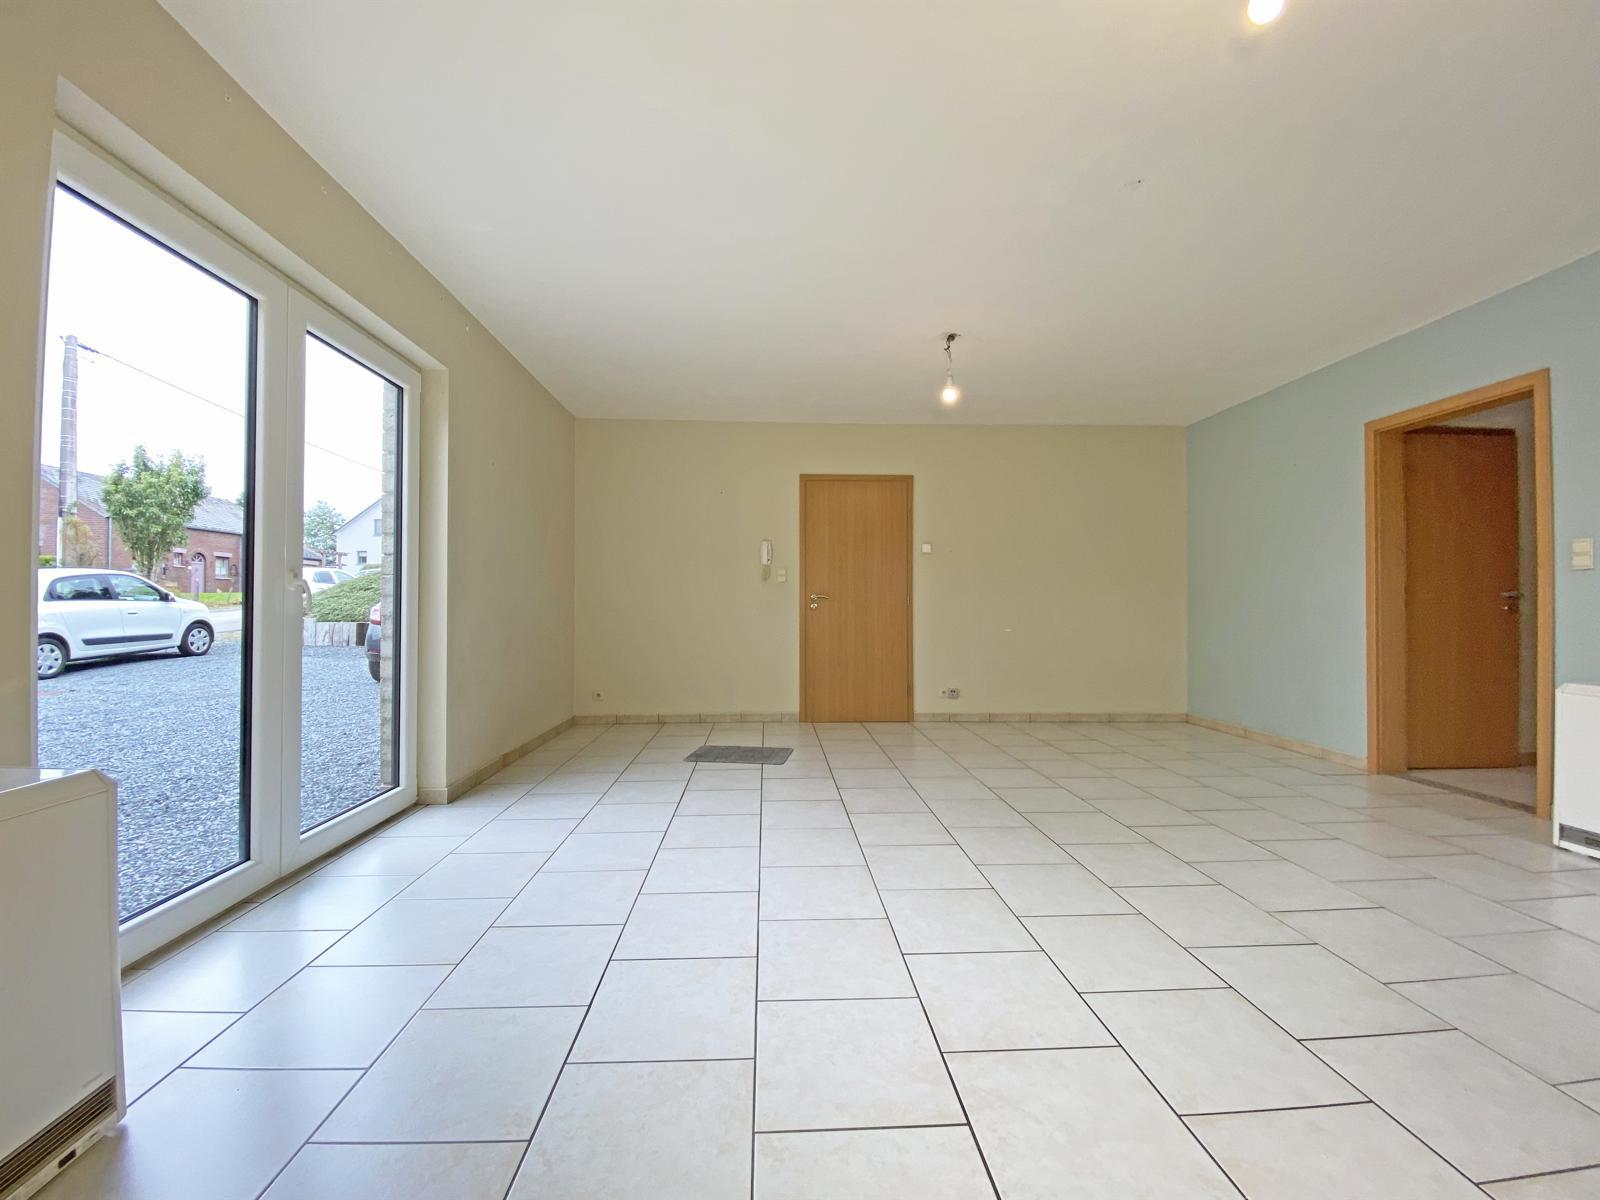 Appartement - Libramont-Chevigny - #4501598-3